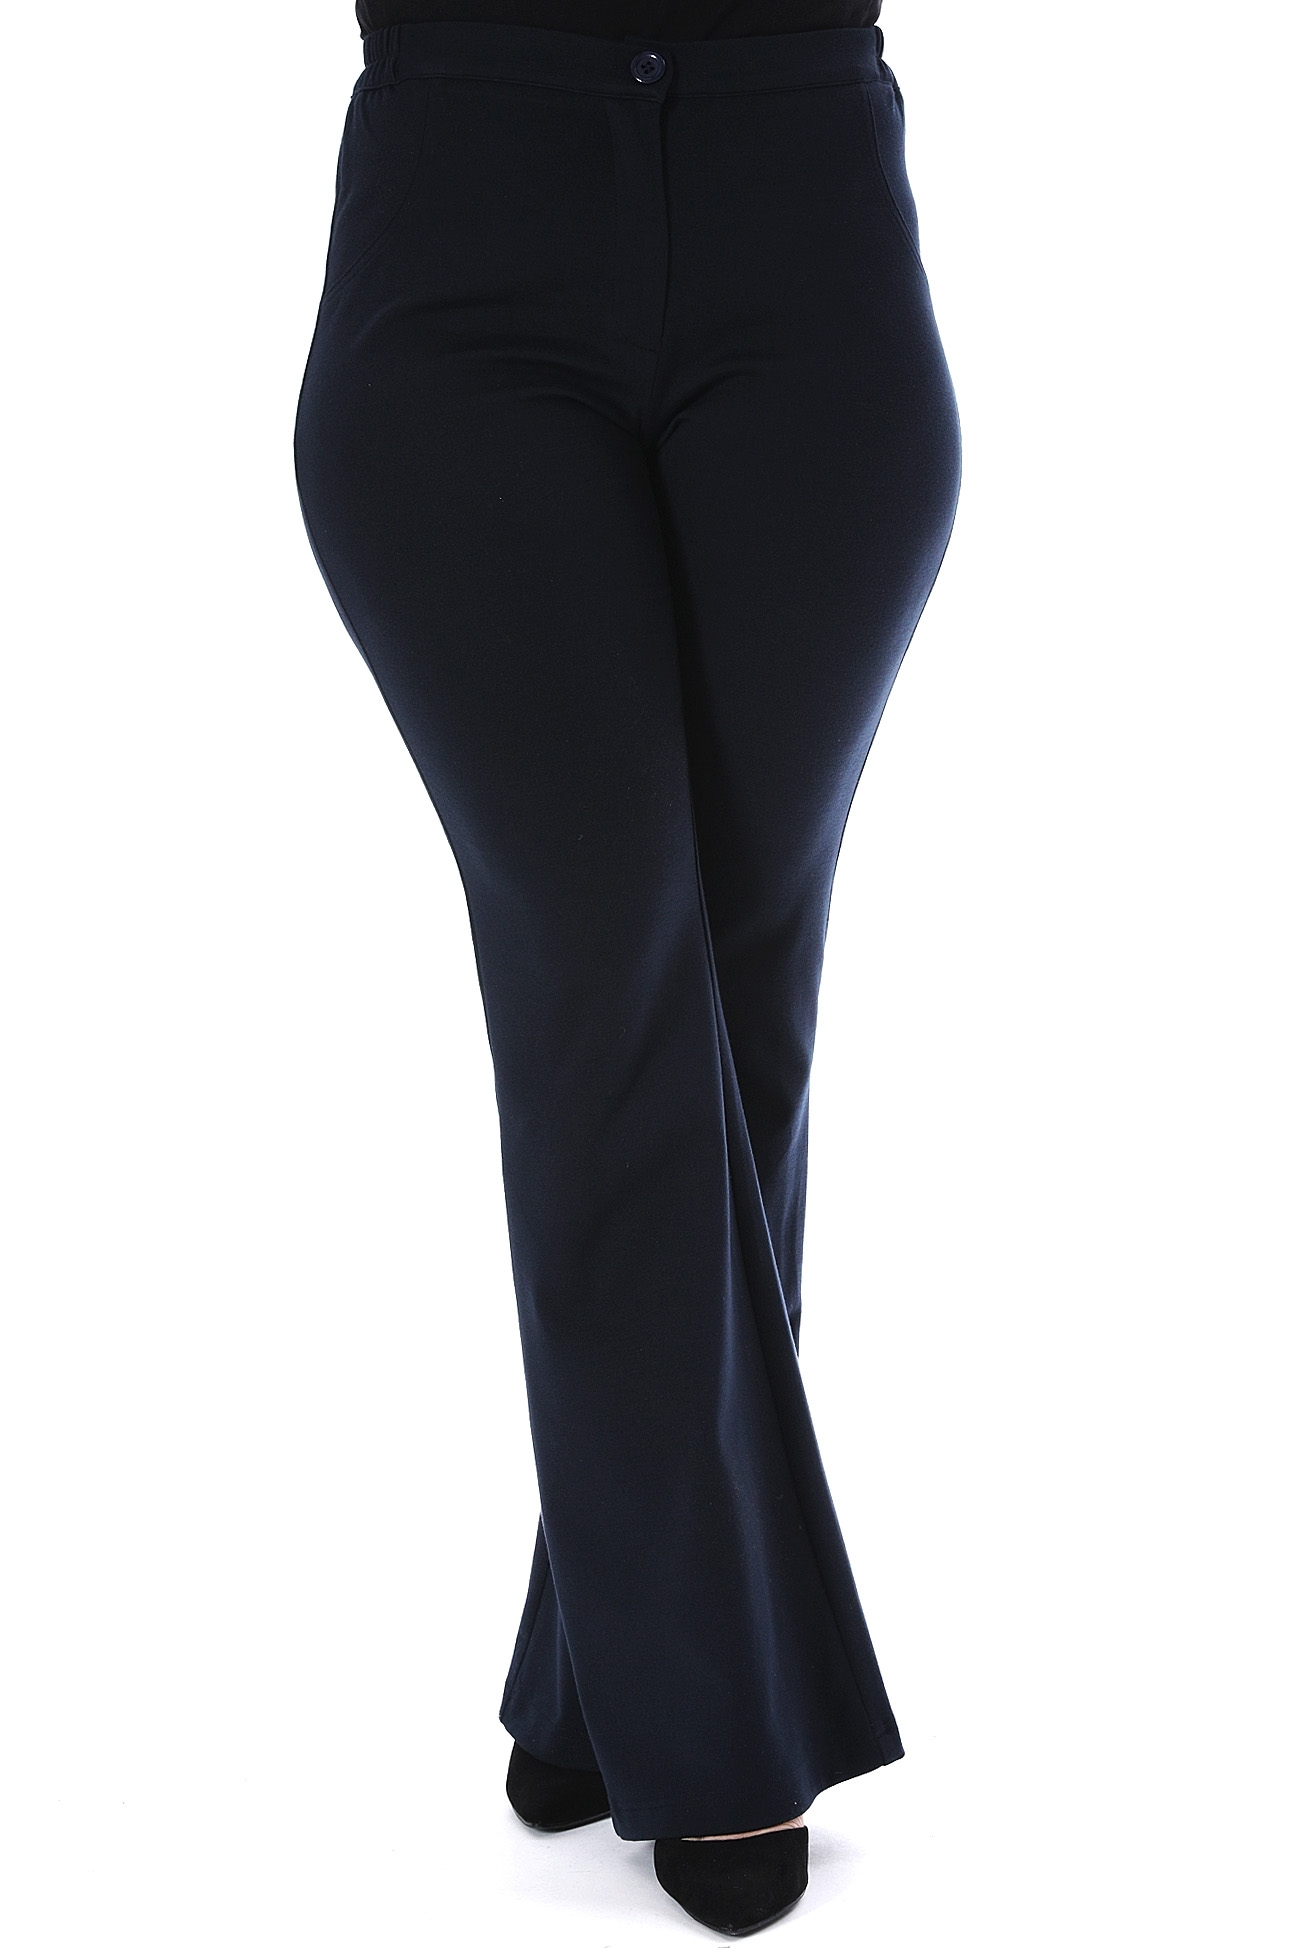 Update   Βρεφικό αμάνικο γιλέκο-φούτερ με κουκούλα (12 μηνών-5 ετών ... 056a1df2fdd